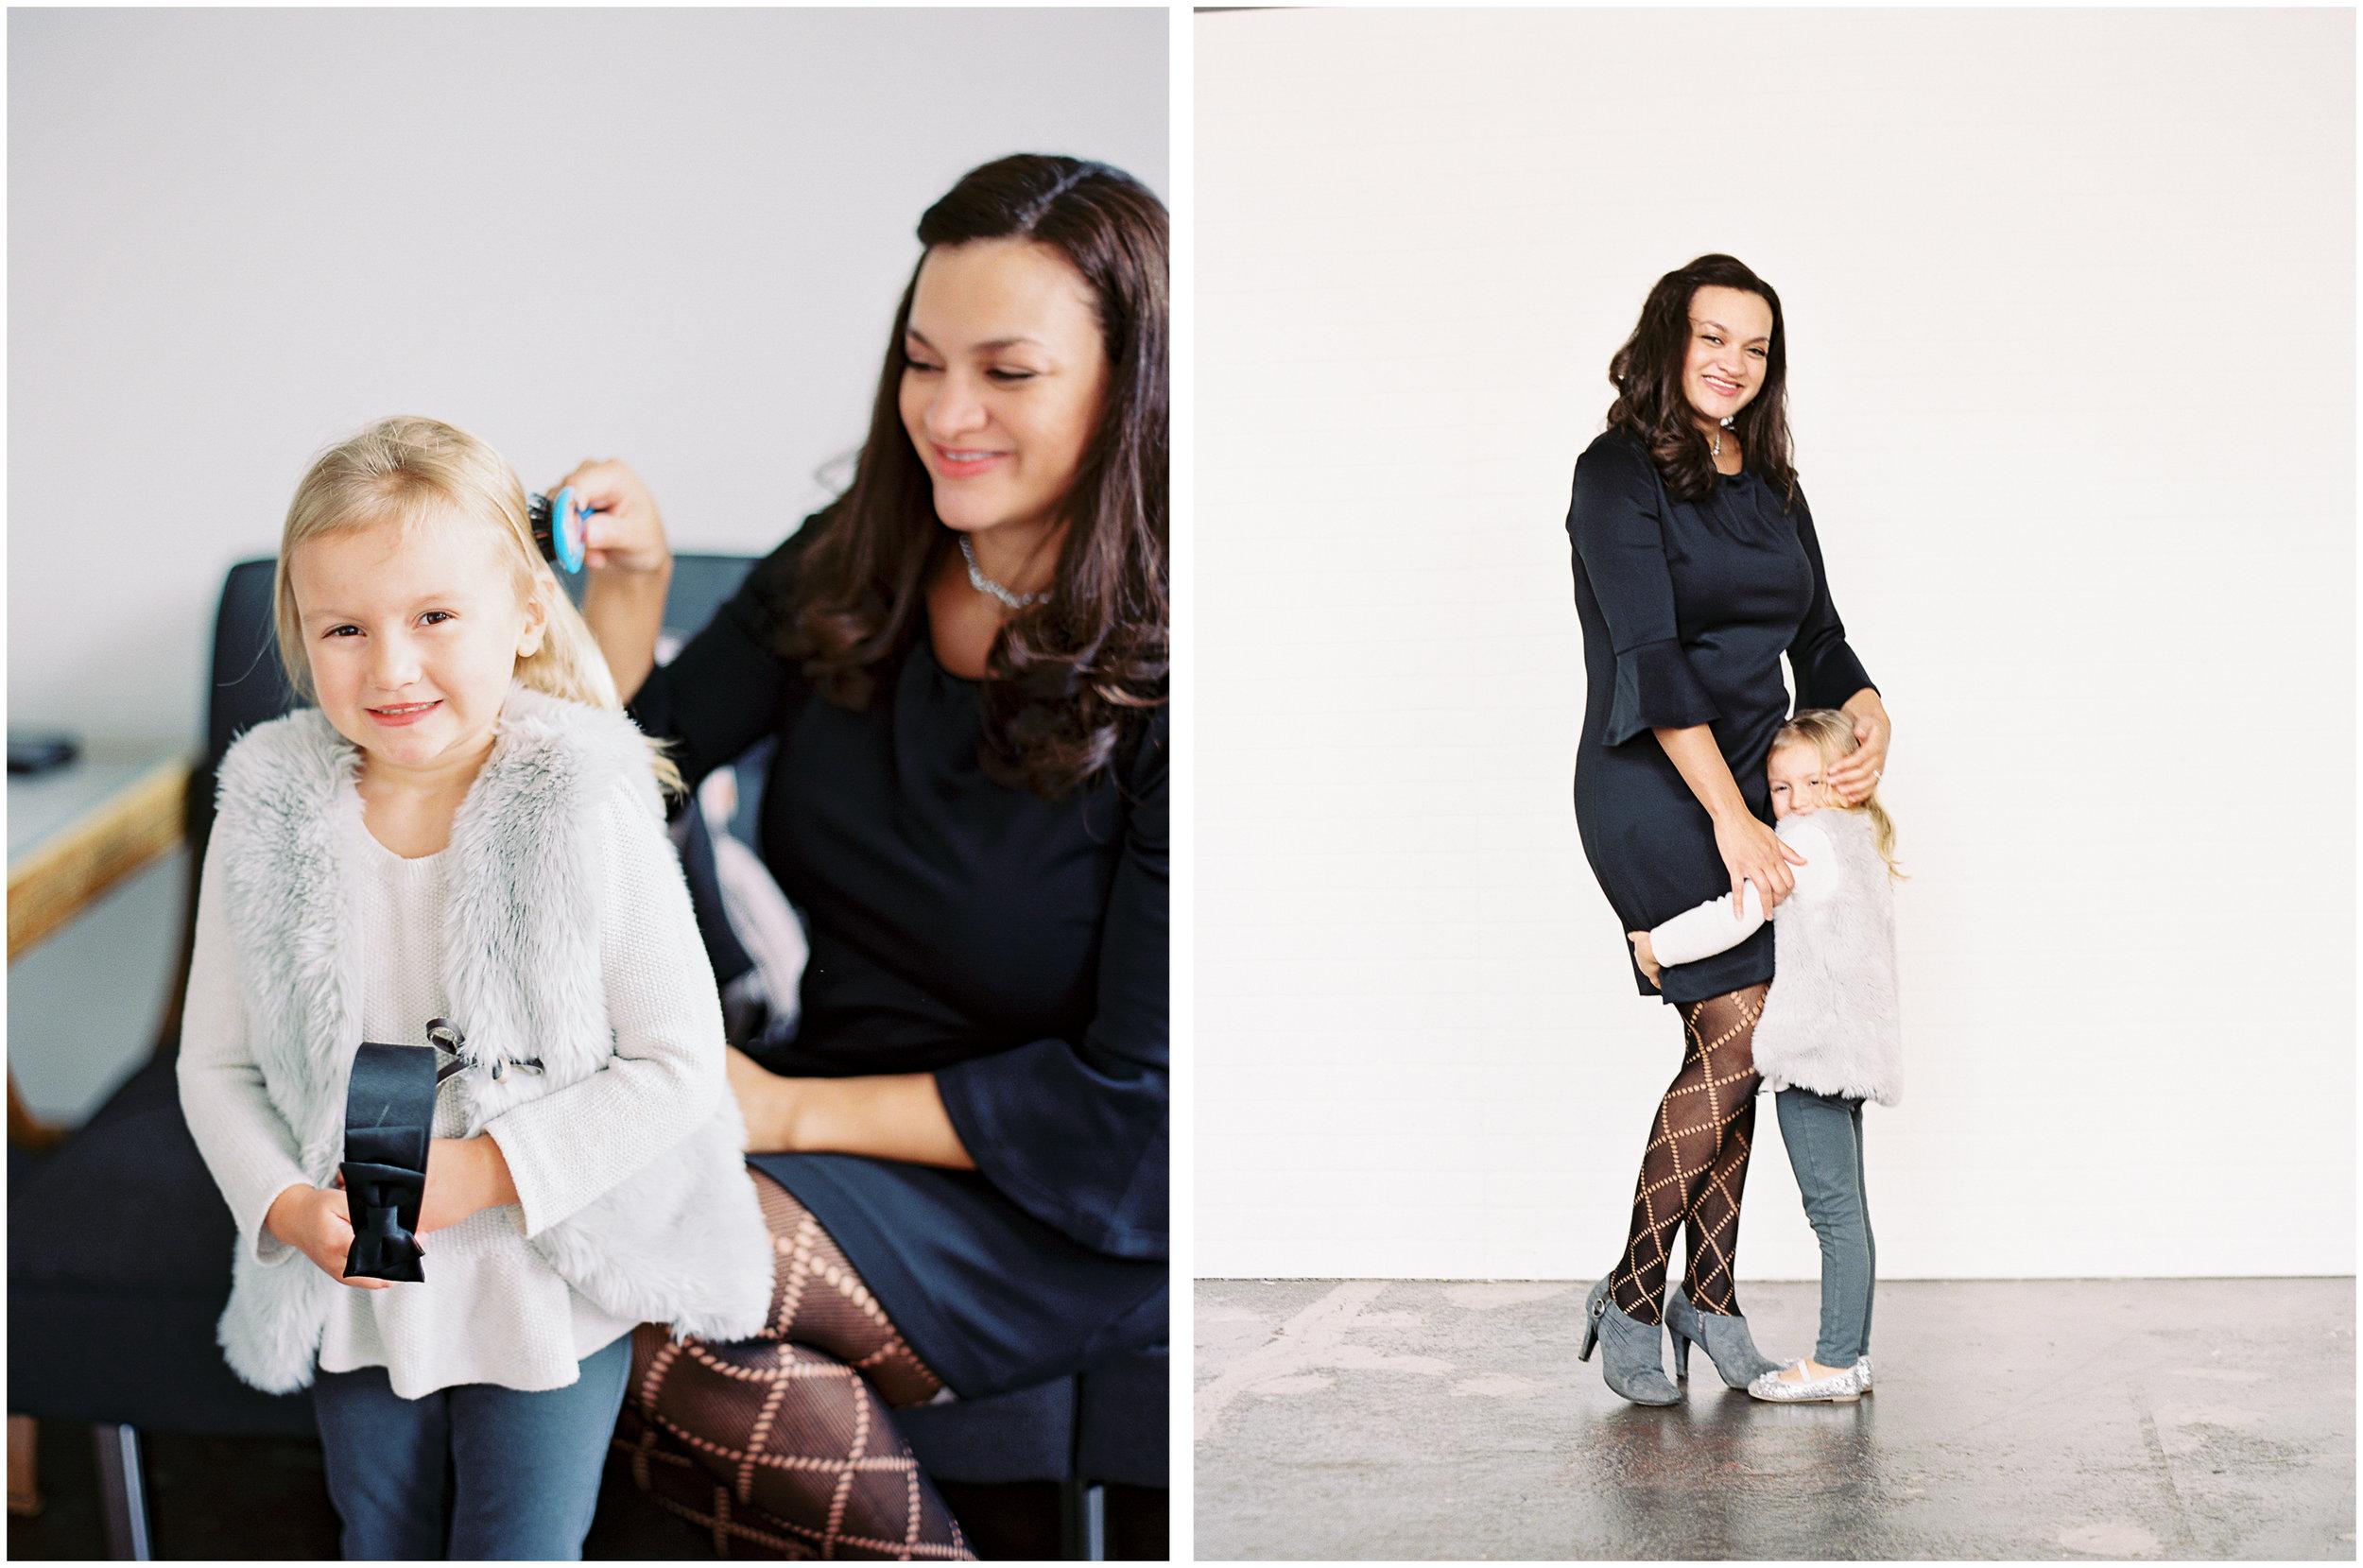 pittsburgh-newborn-family-photographer-Steven-Dray-family-anna-laero-photography-8.jpg